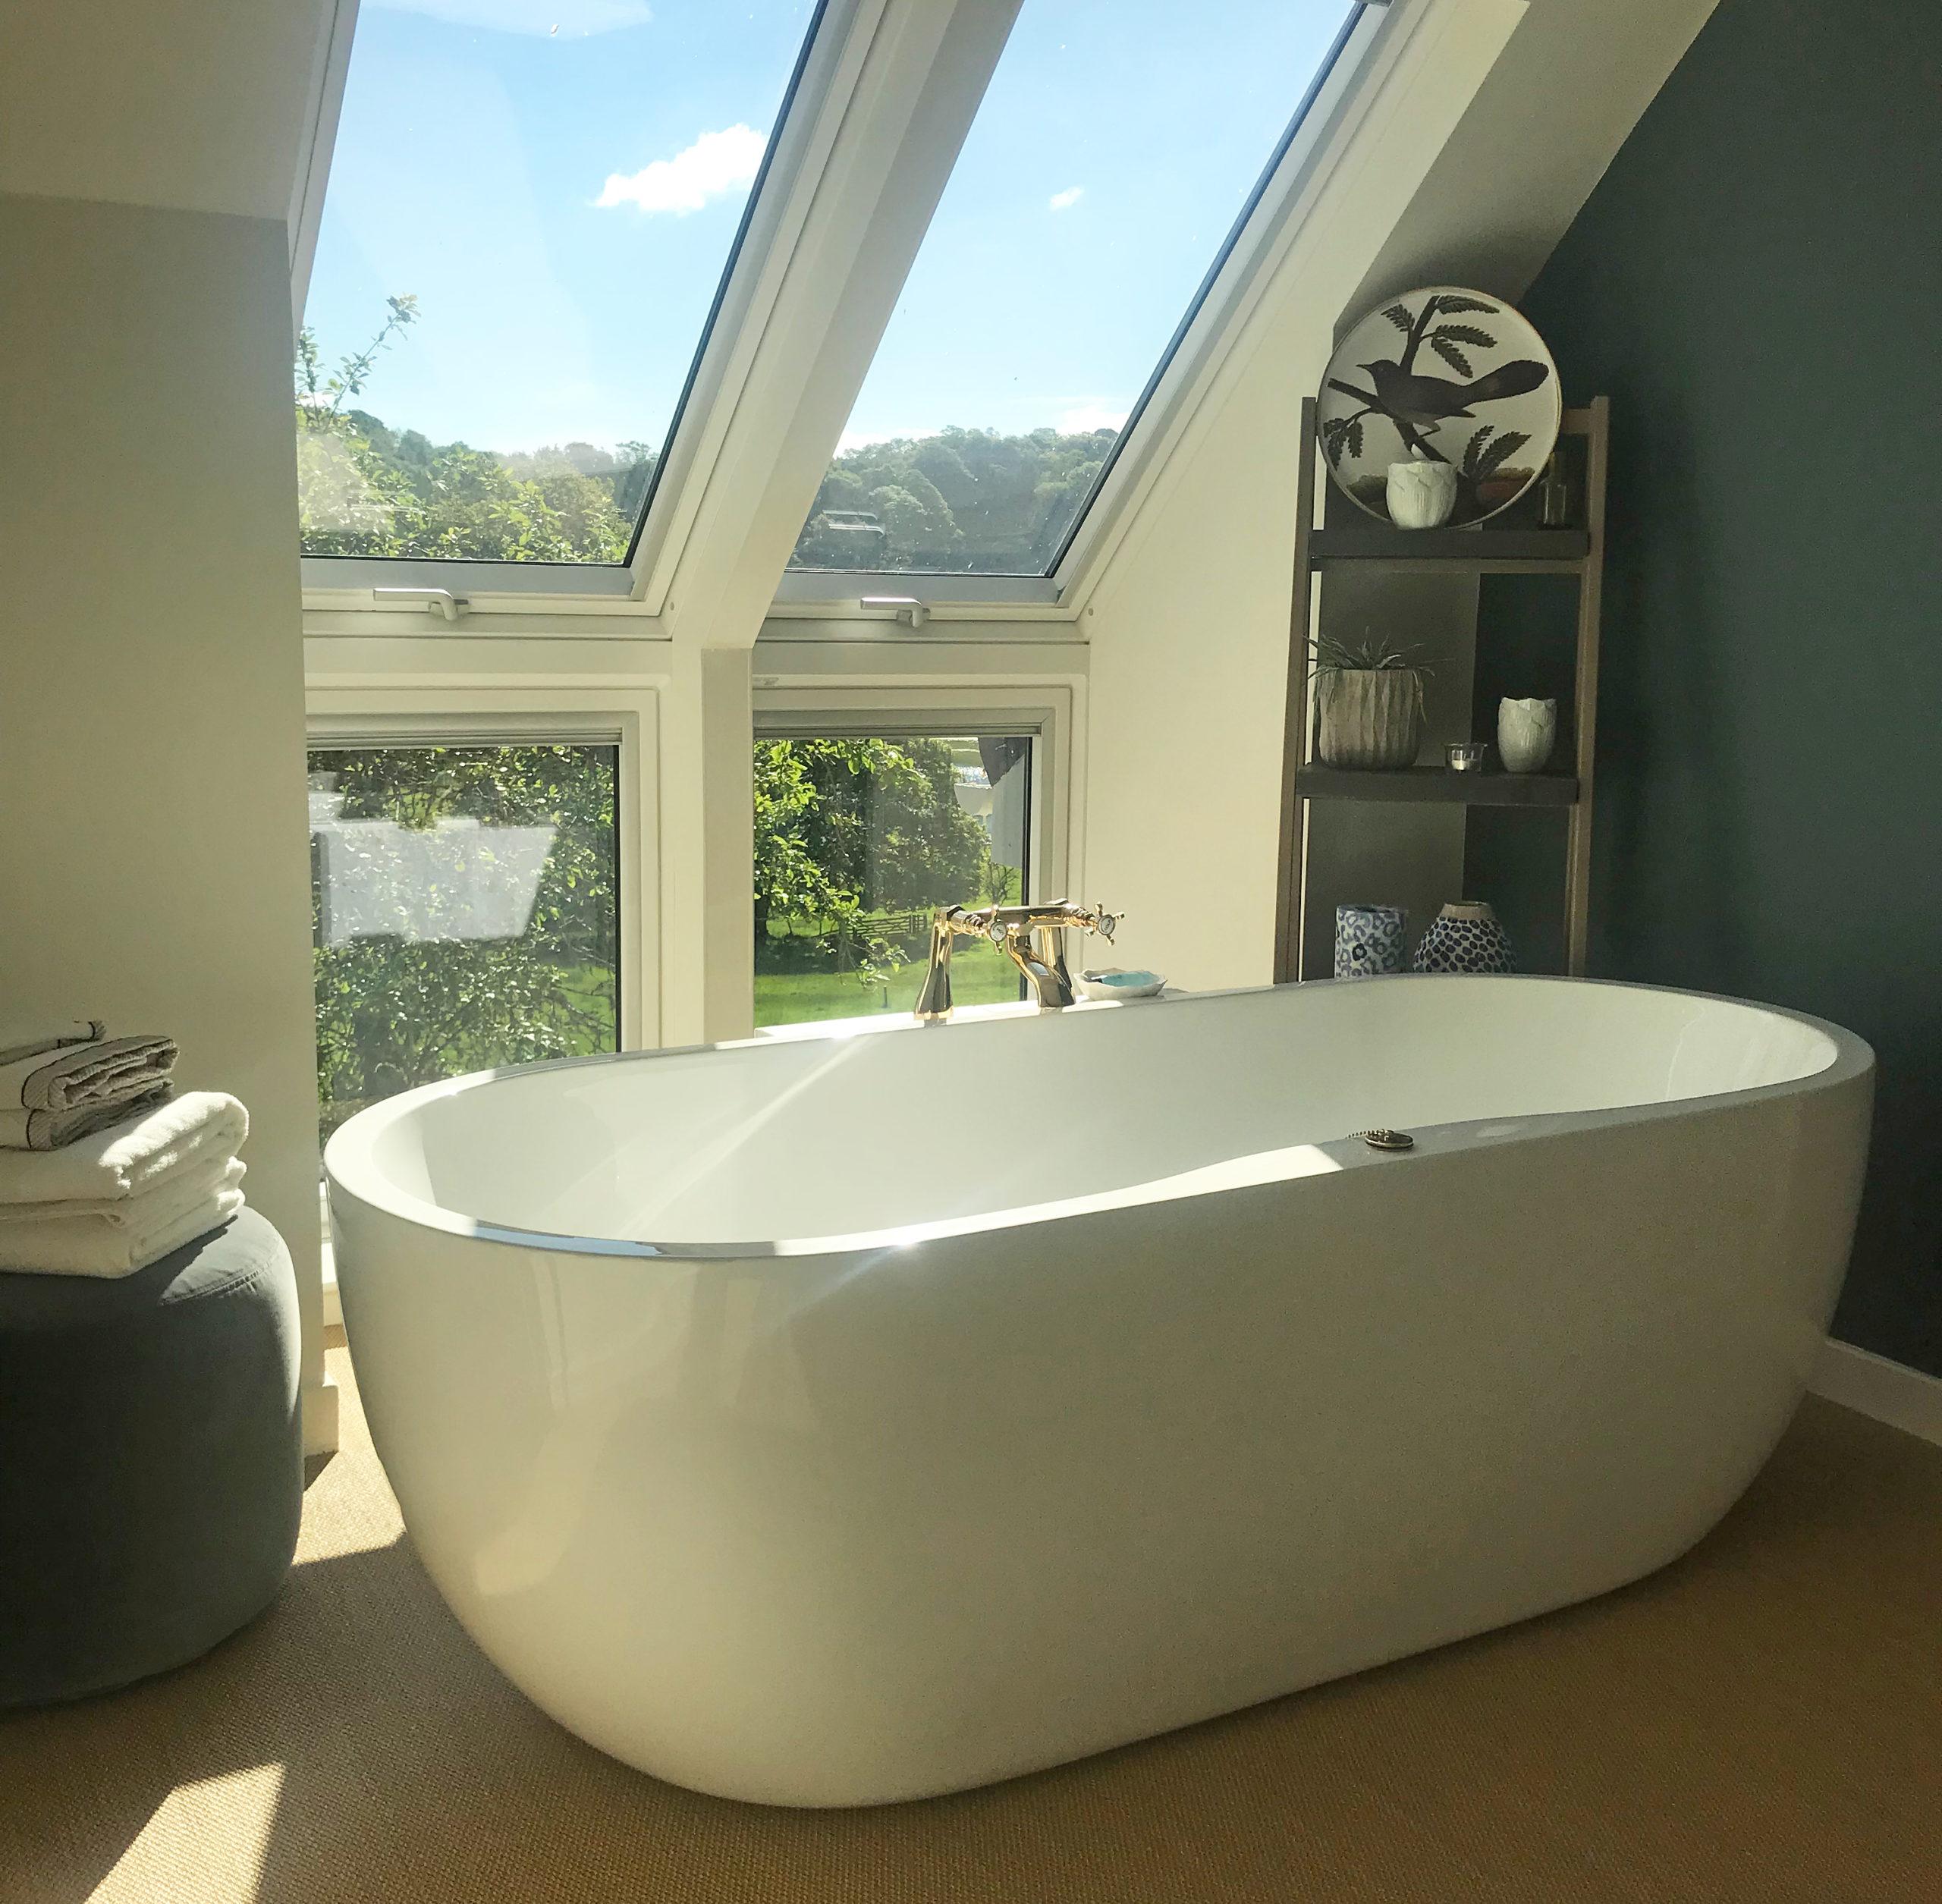 Lochside Bolthole - bathtub